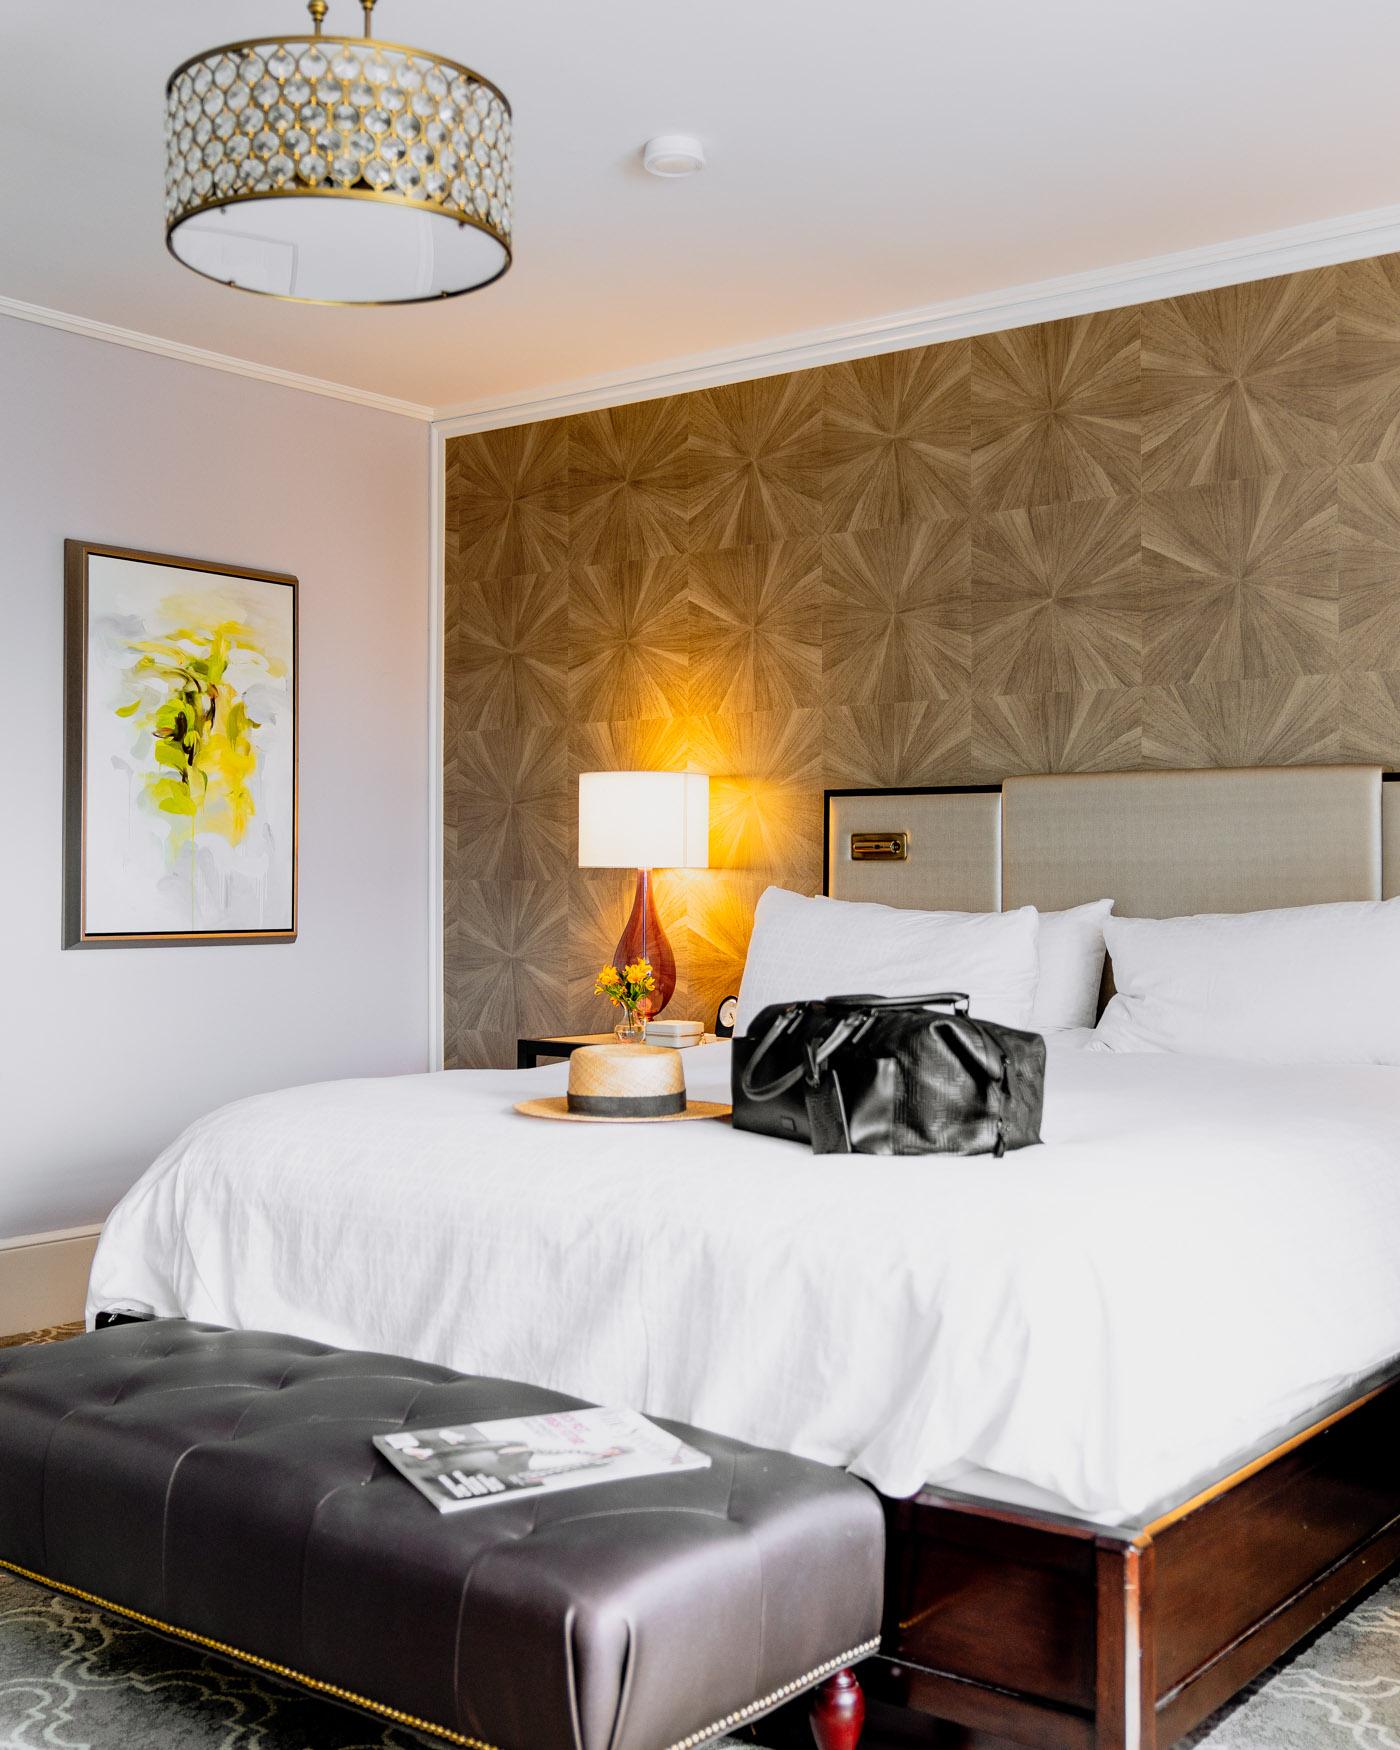 staypineapple-san-francisco-hotel-6.jpg